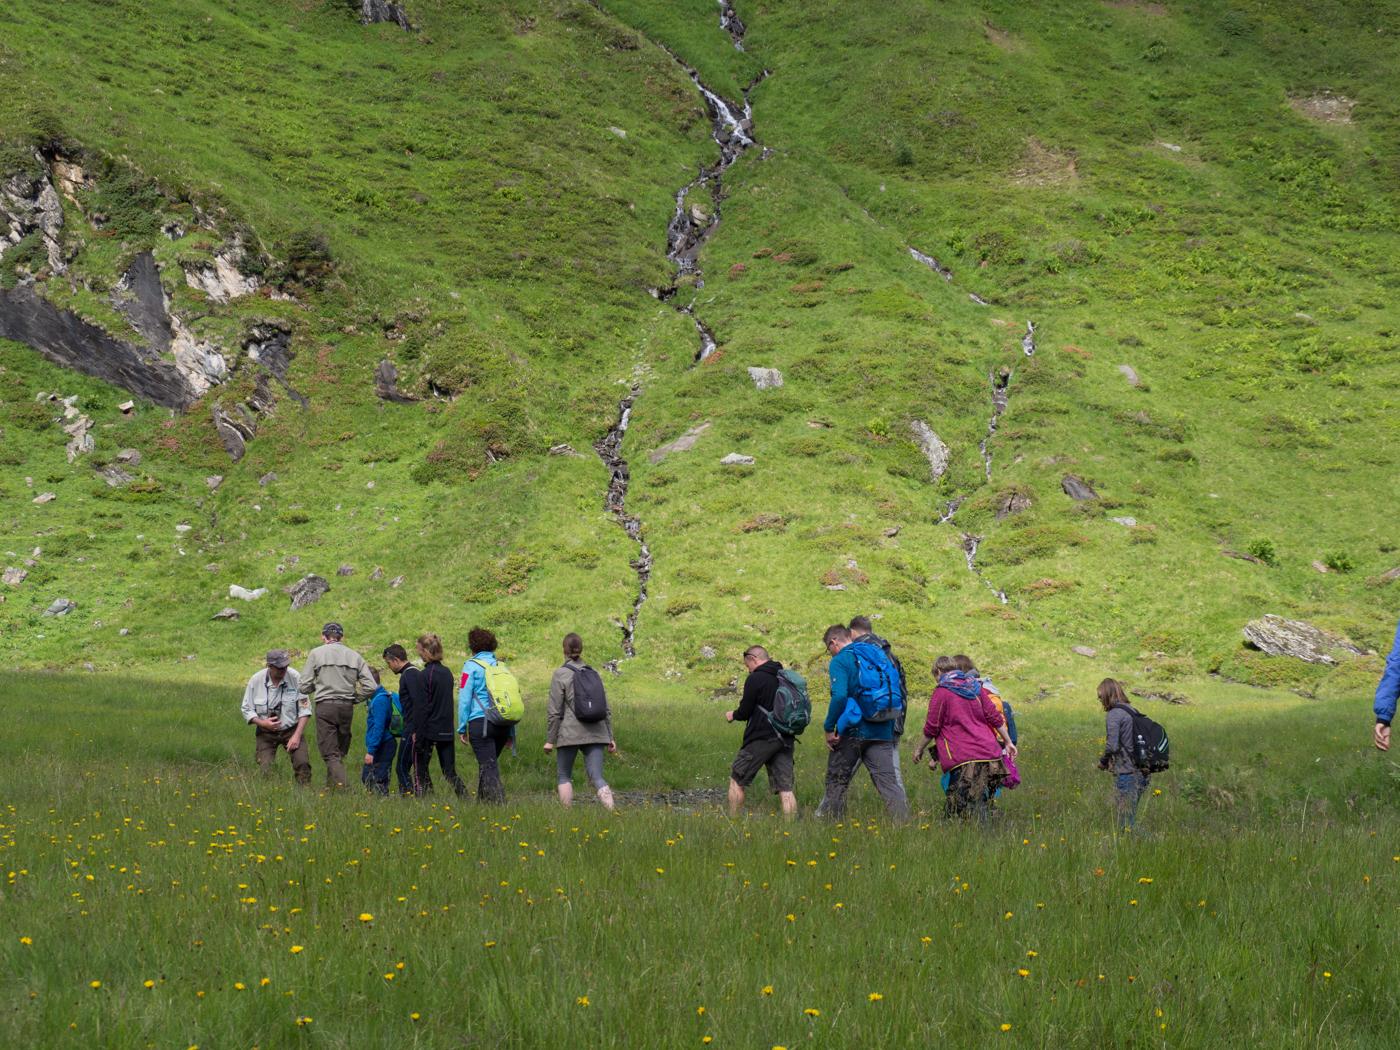 Wandern in der Tundra-Zone.